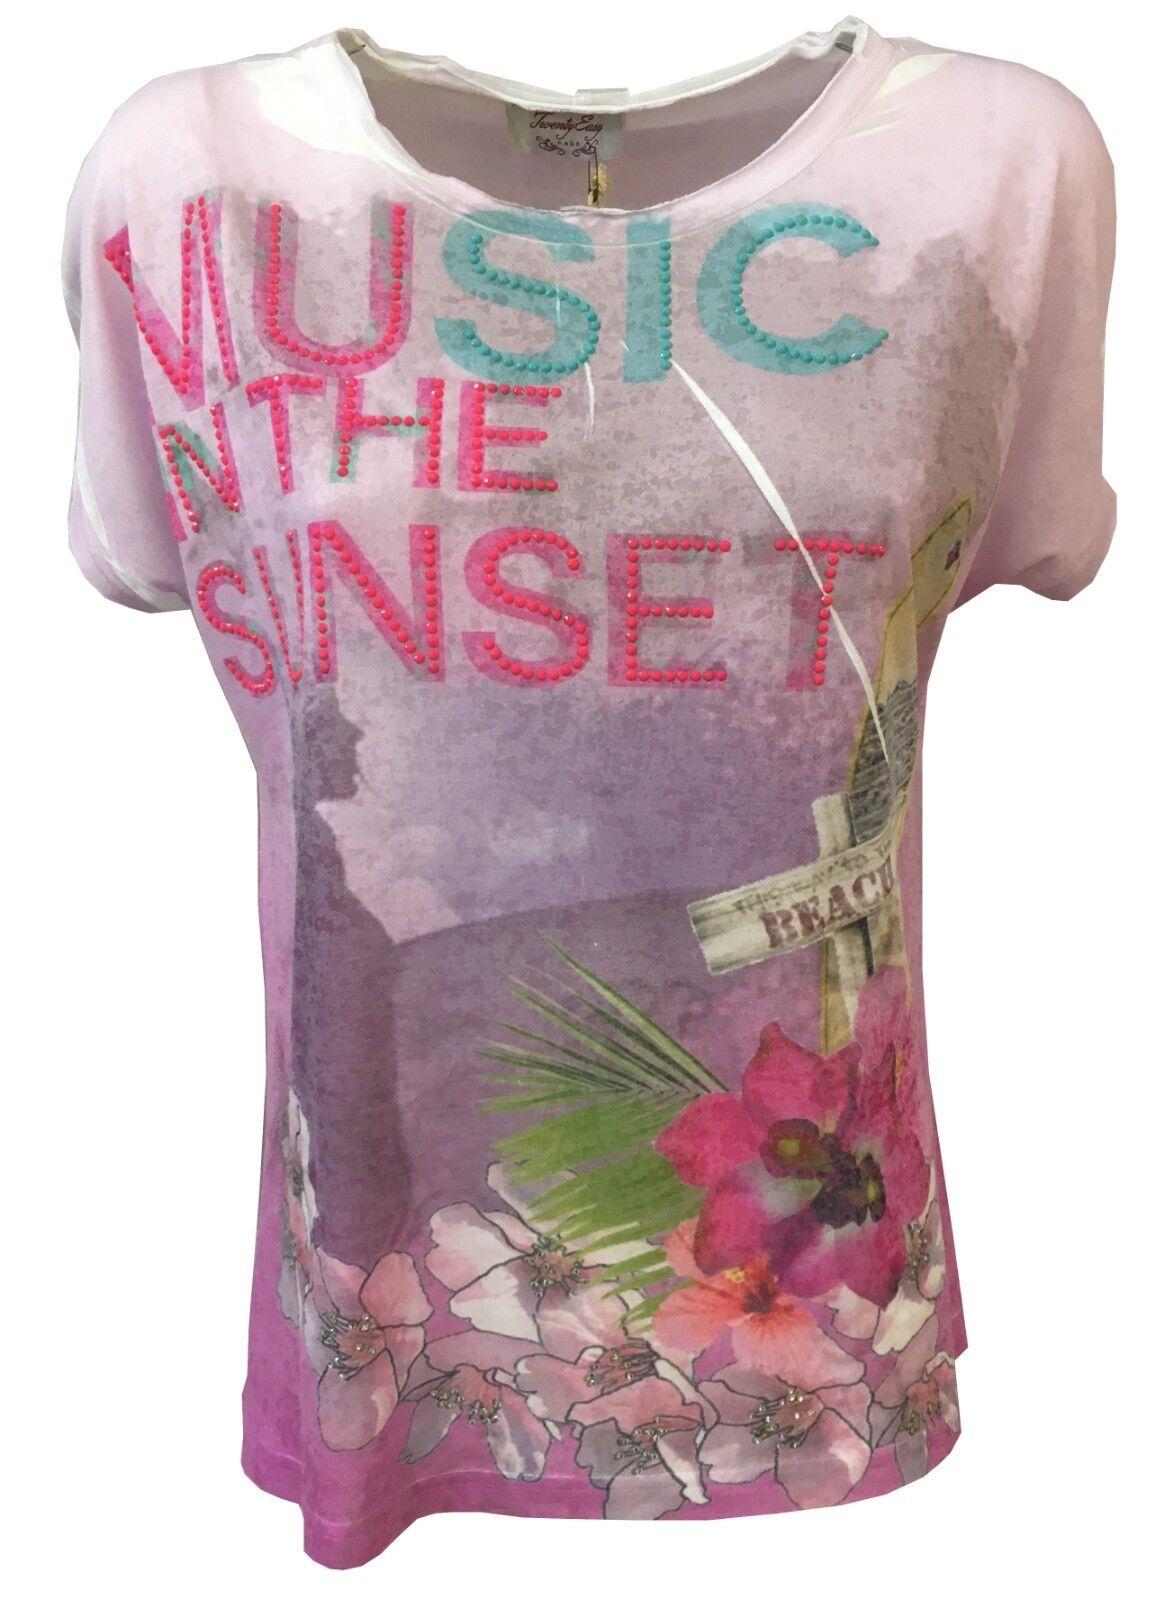 TWENTY EASY by KAOS t- Hemd Frau 82% Polyester 18% Viskose made in italy